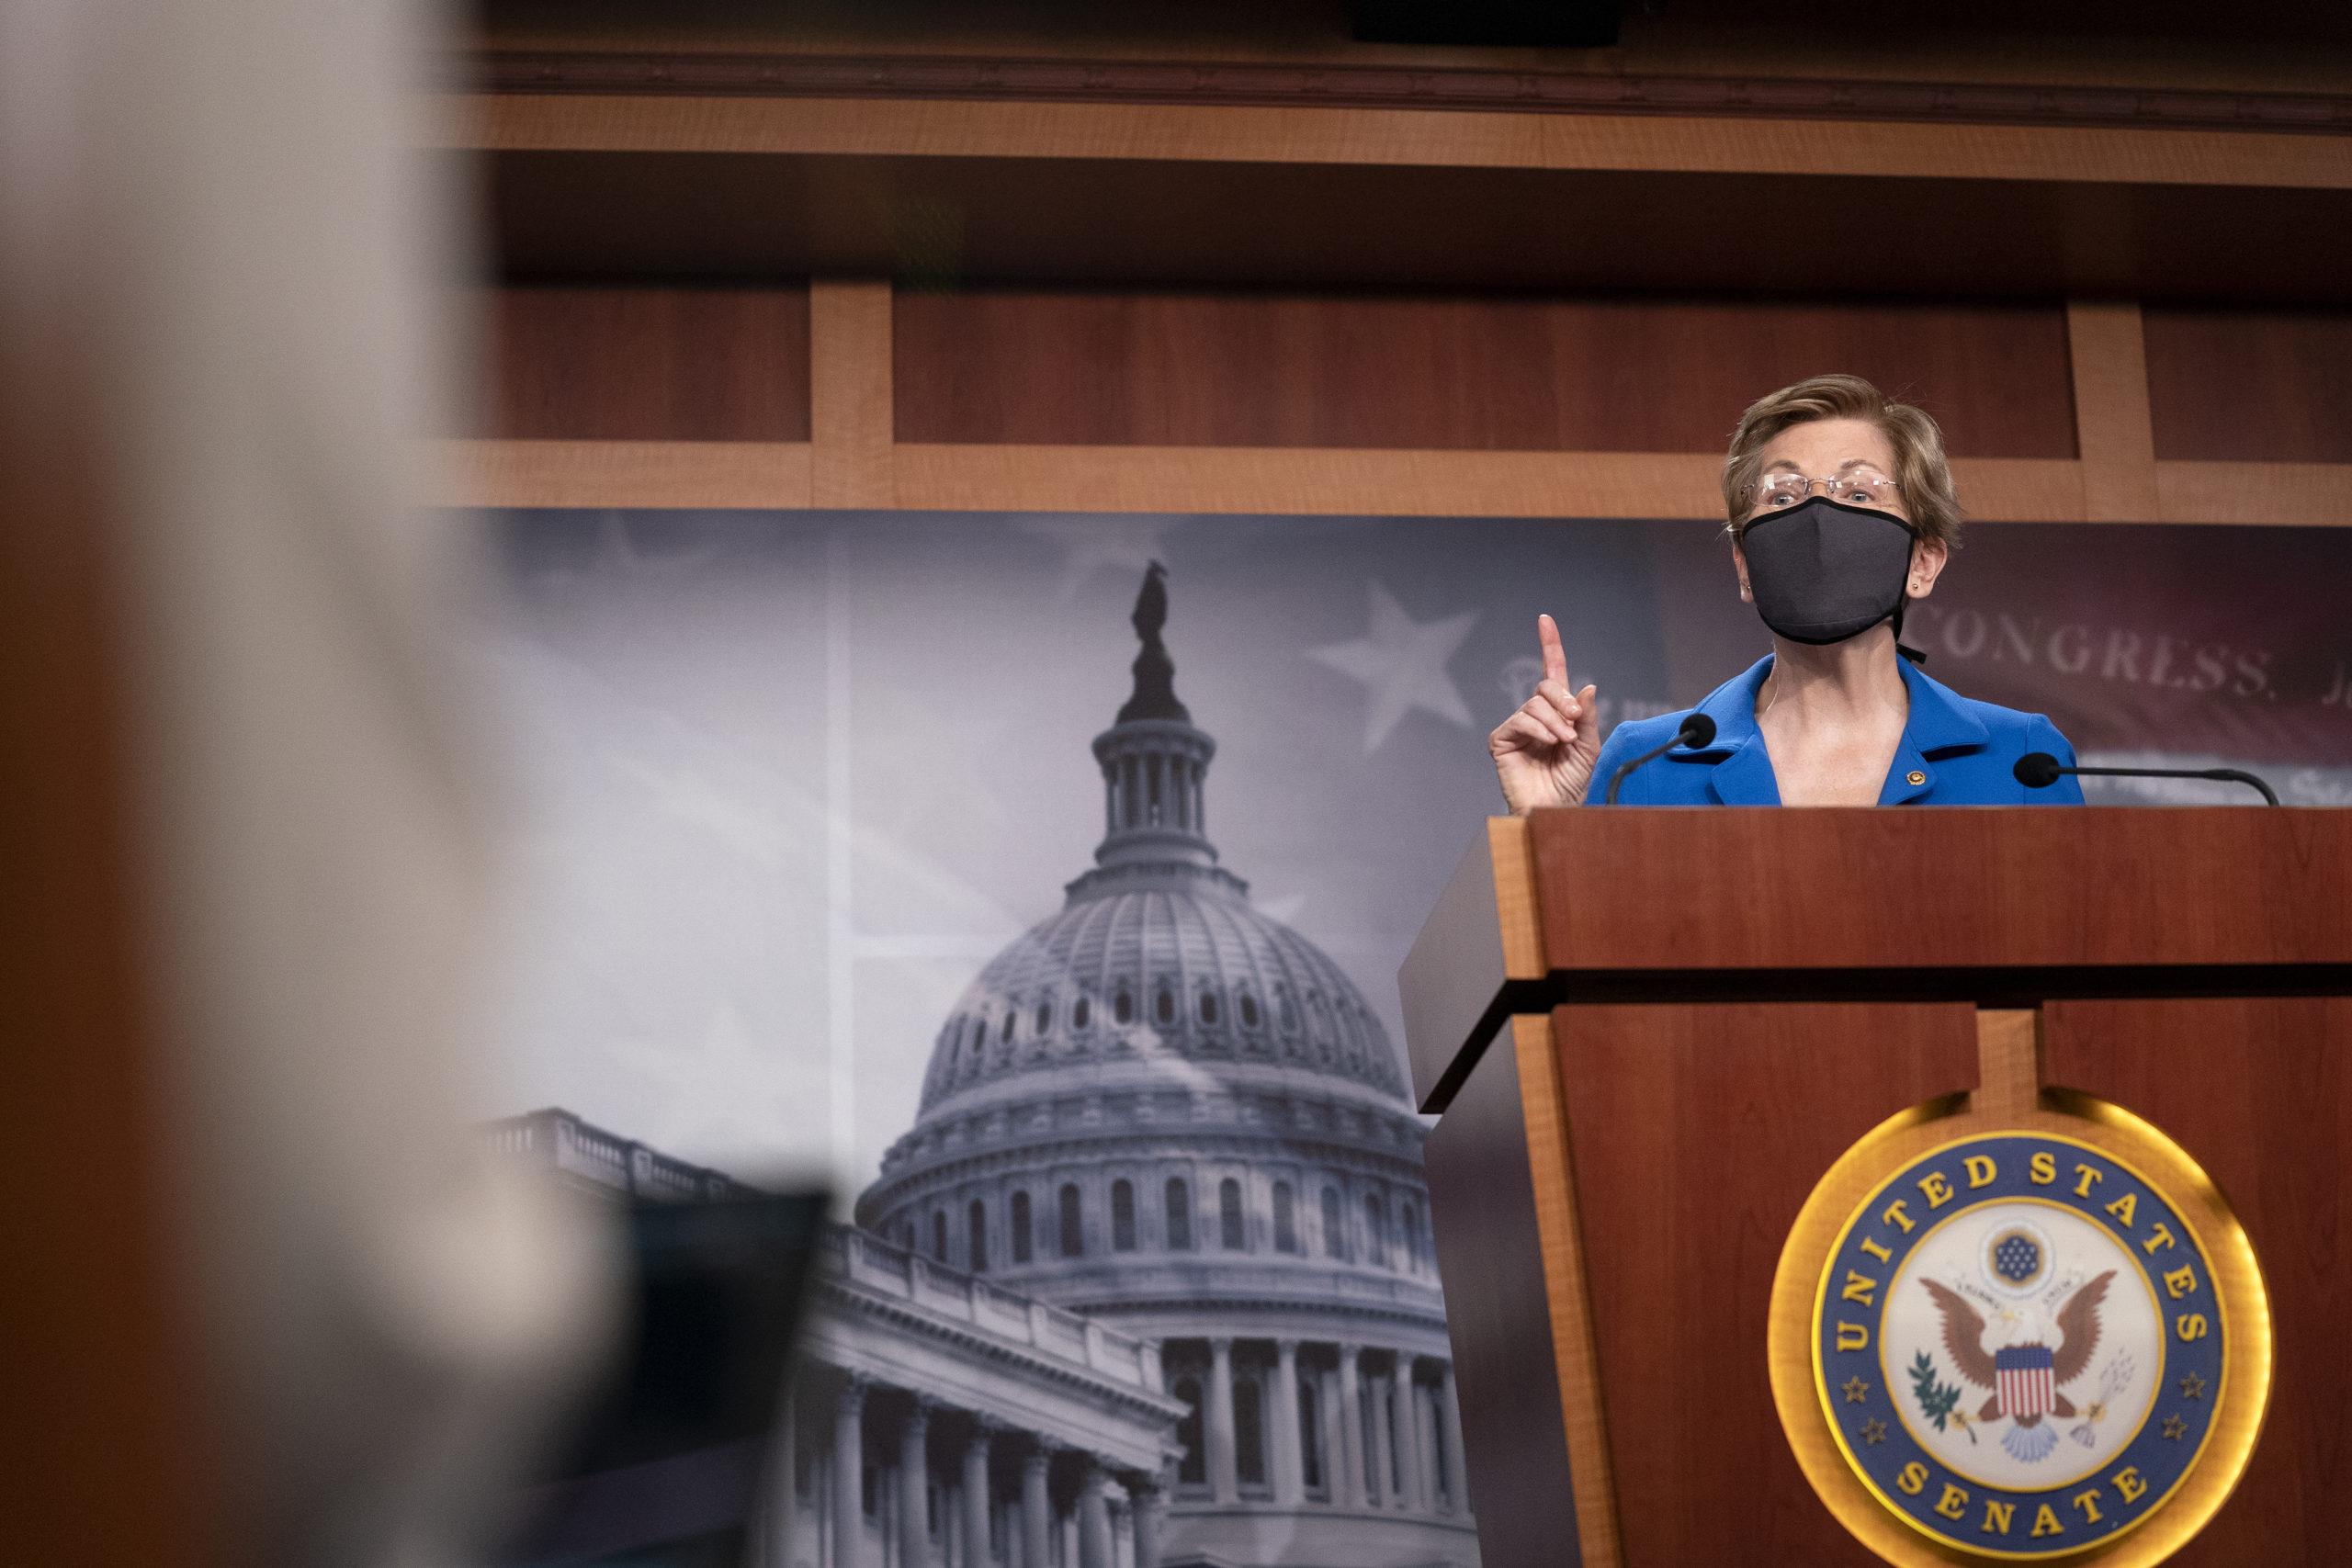 Massachusetts Sen. Elizabeth Warren speaks during a news conference on Capitol Hill on Oct. 20. (Stefani Reynolds/Getty Images)